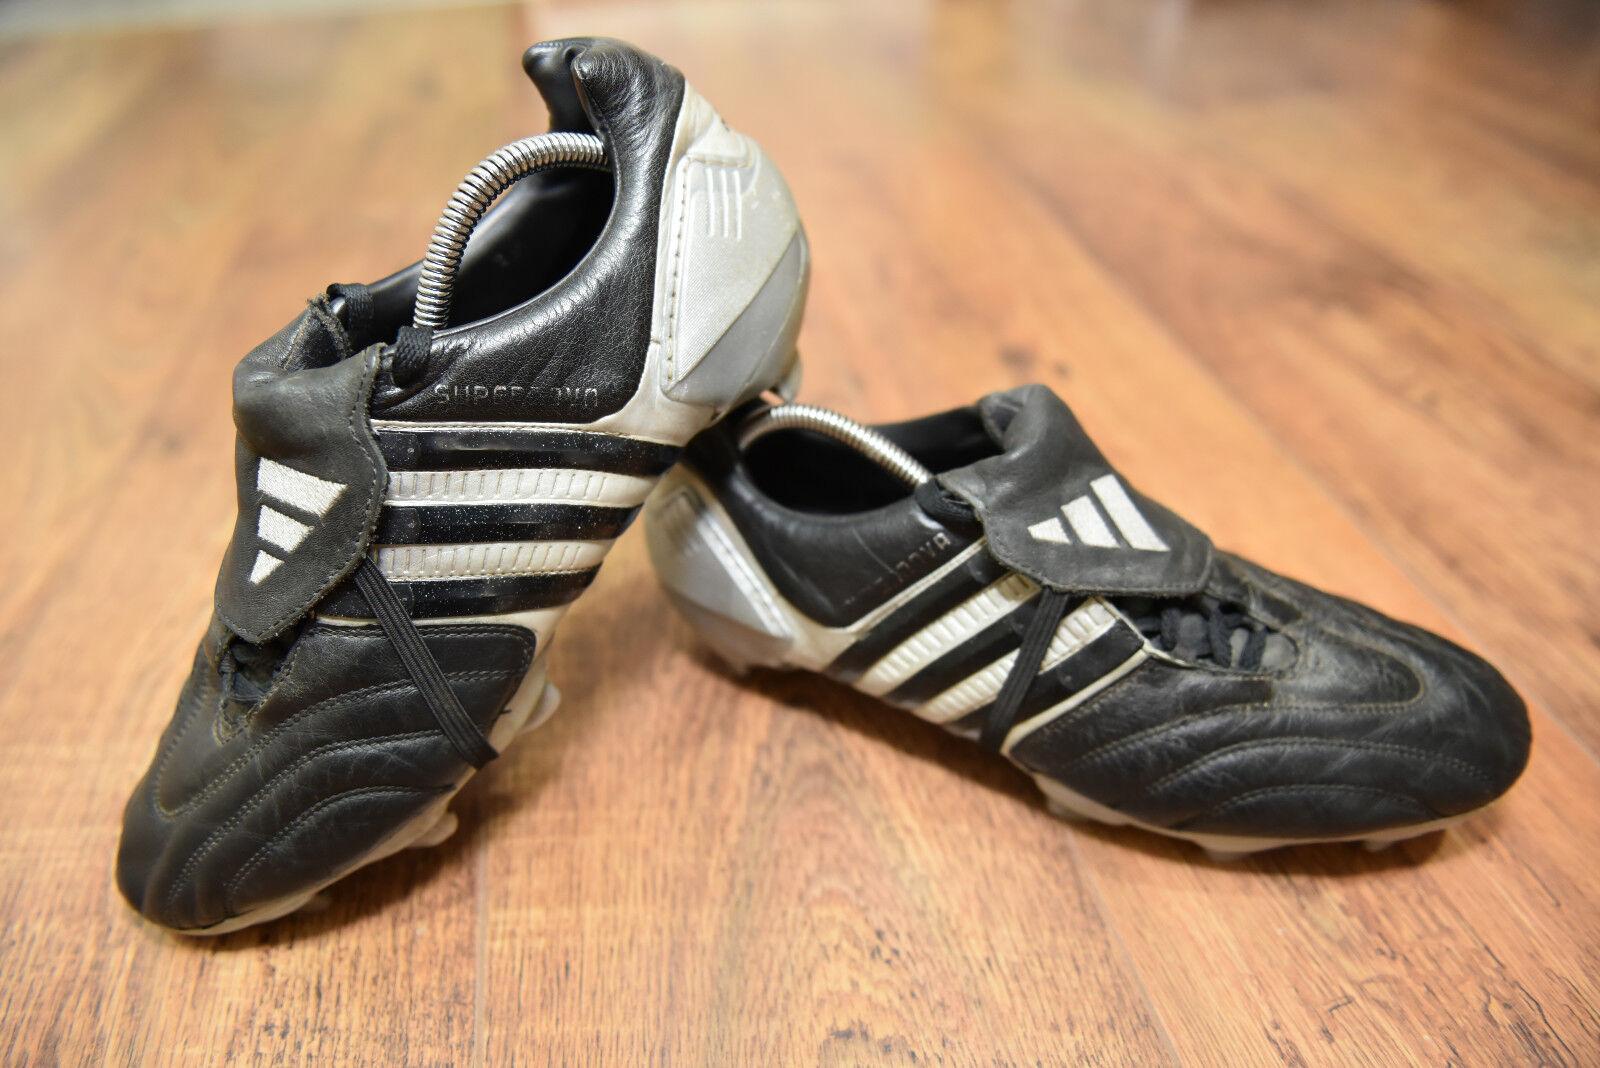 Adidas súpernova Projoator SG Pro botas de fútbol 11 en muy buen estado precisión Mania